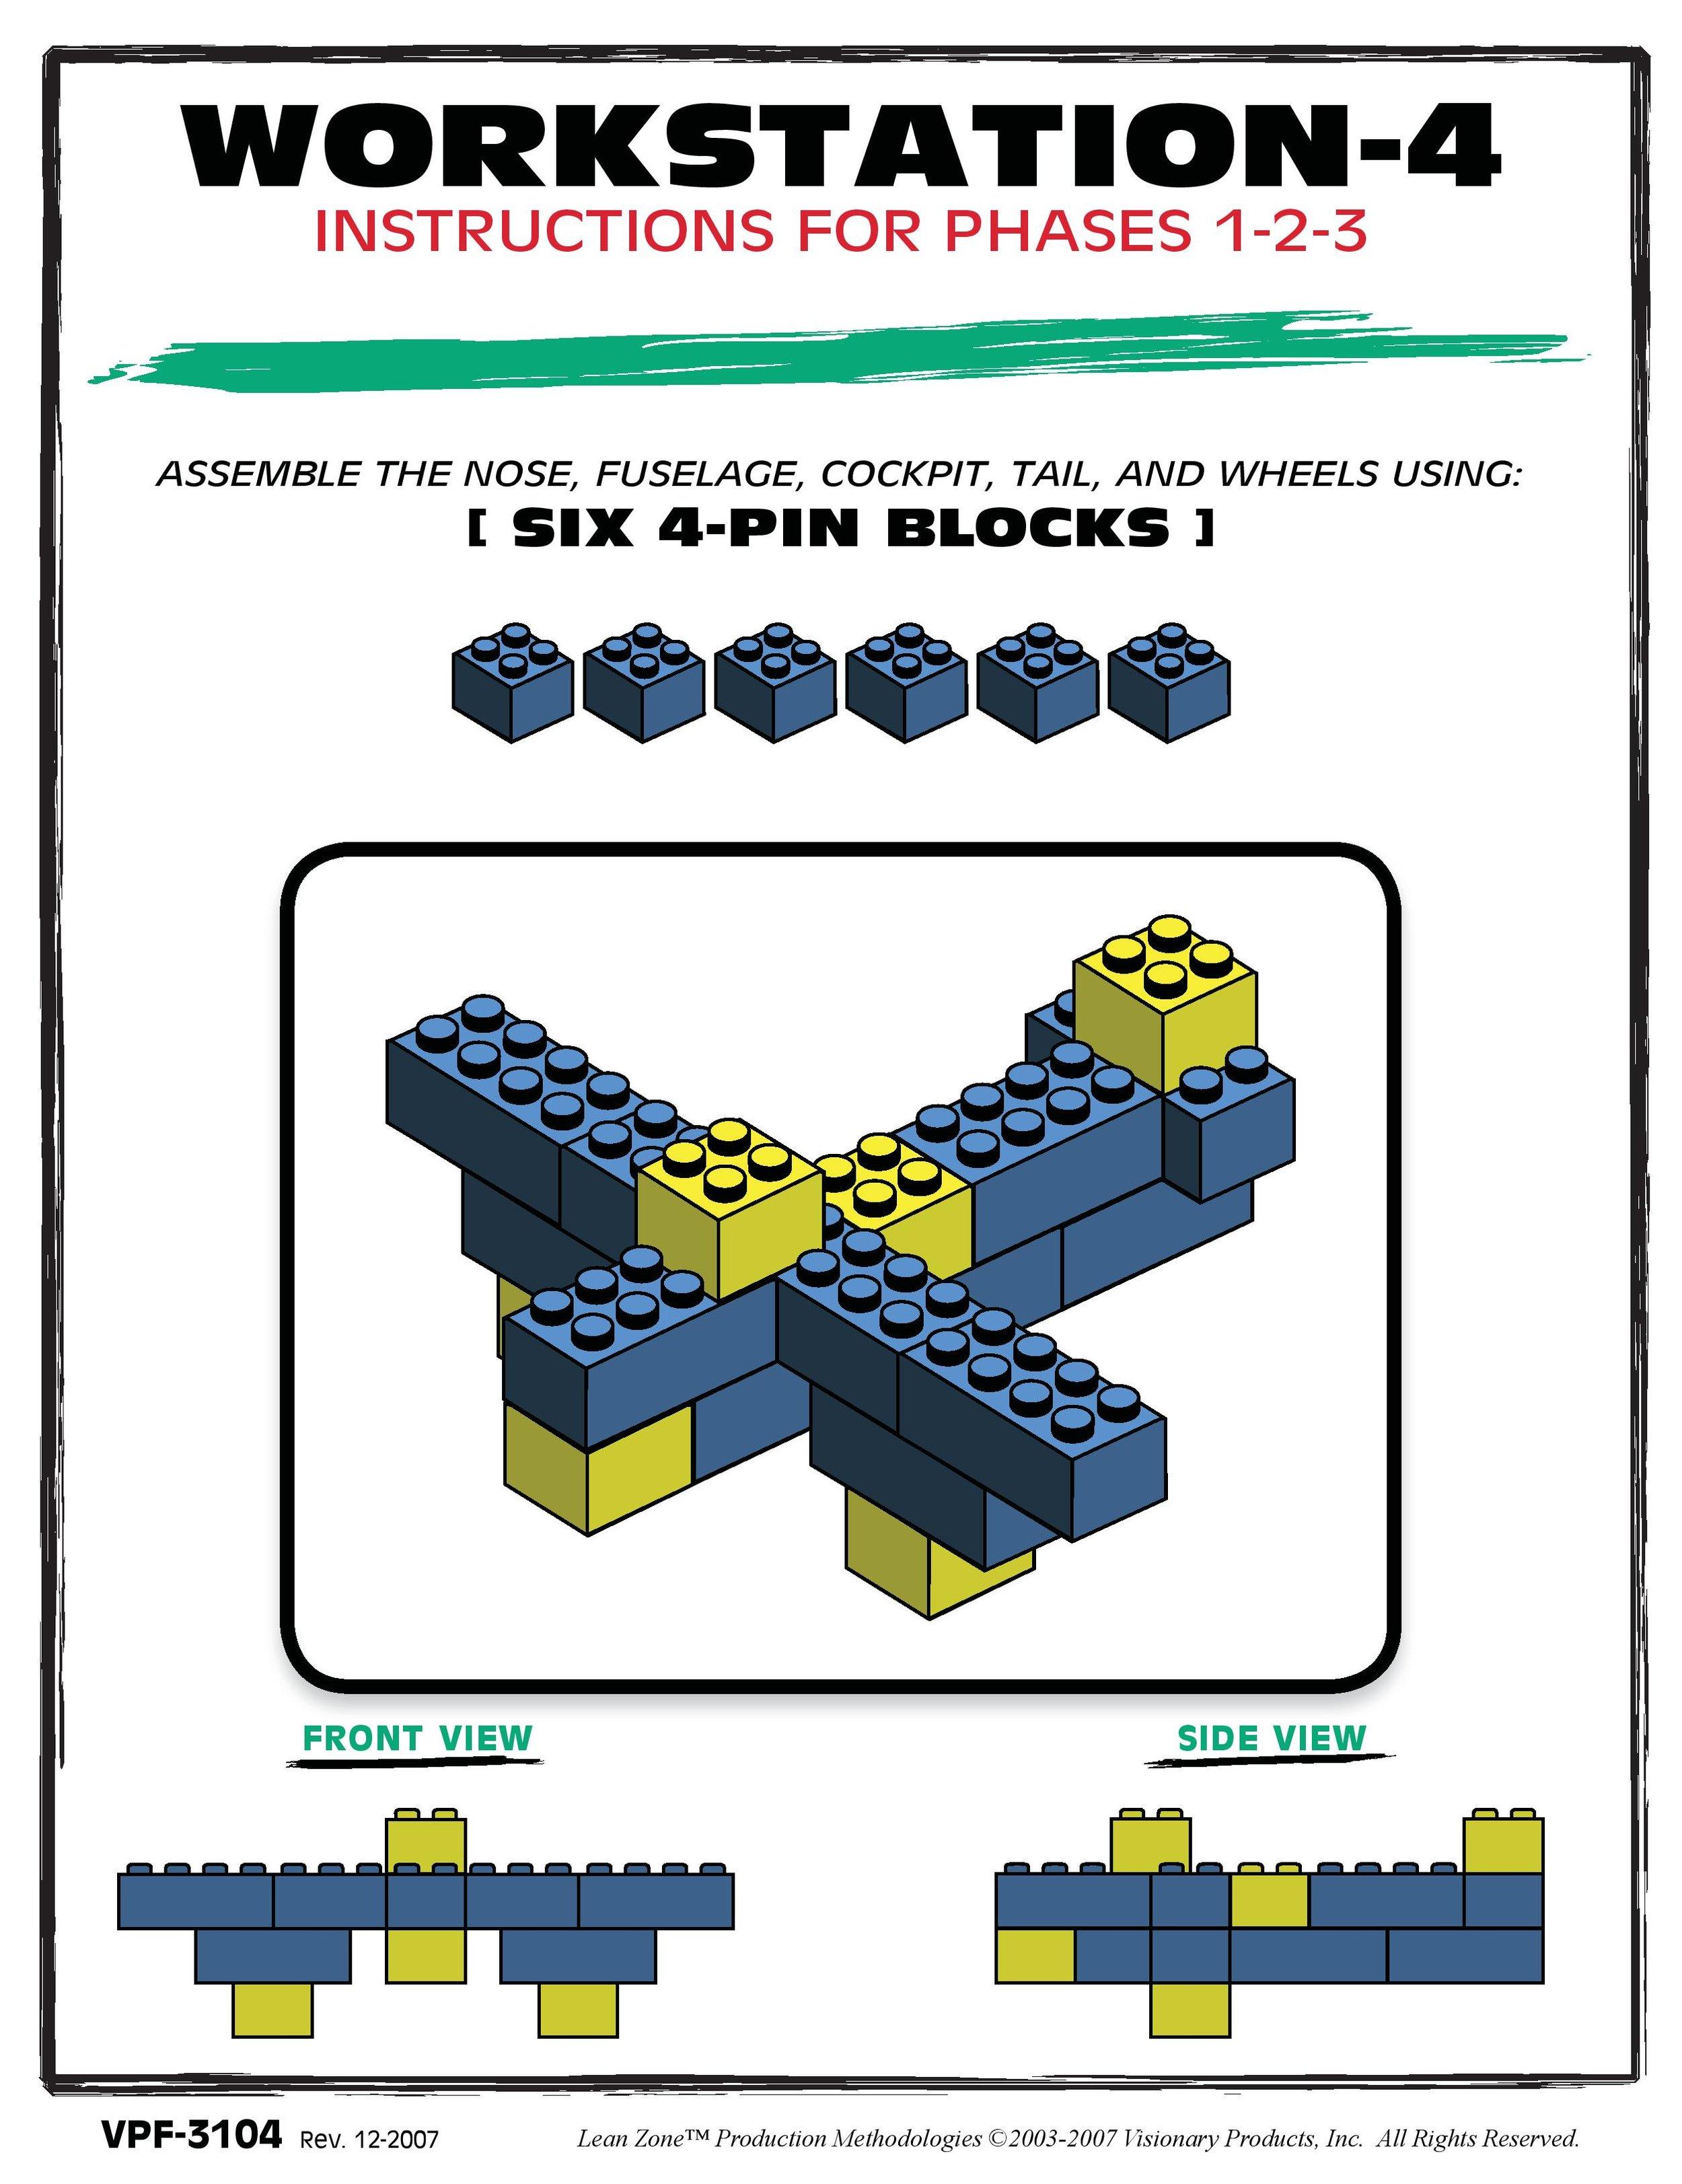 VPF-3104 Rev1207-page-001.jpg